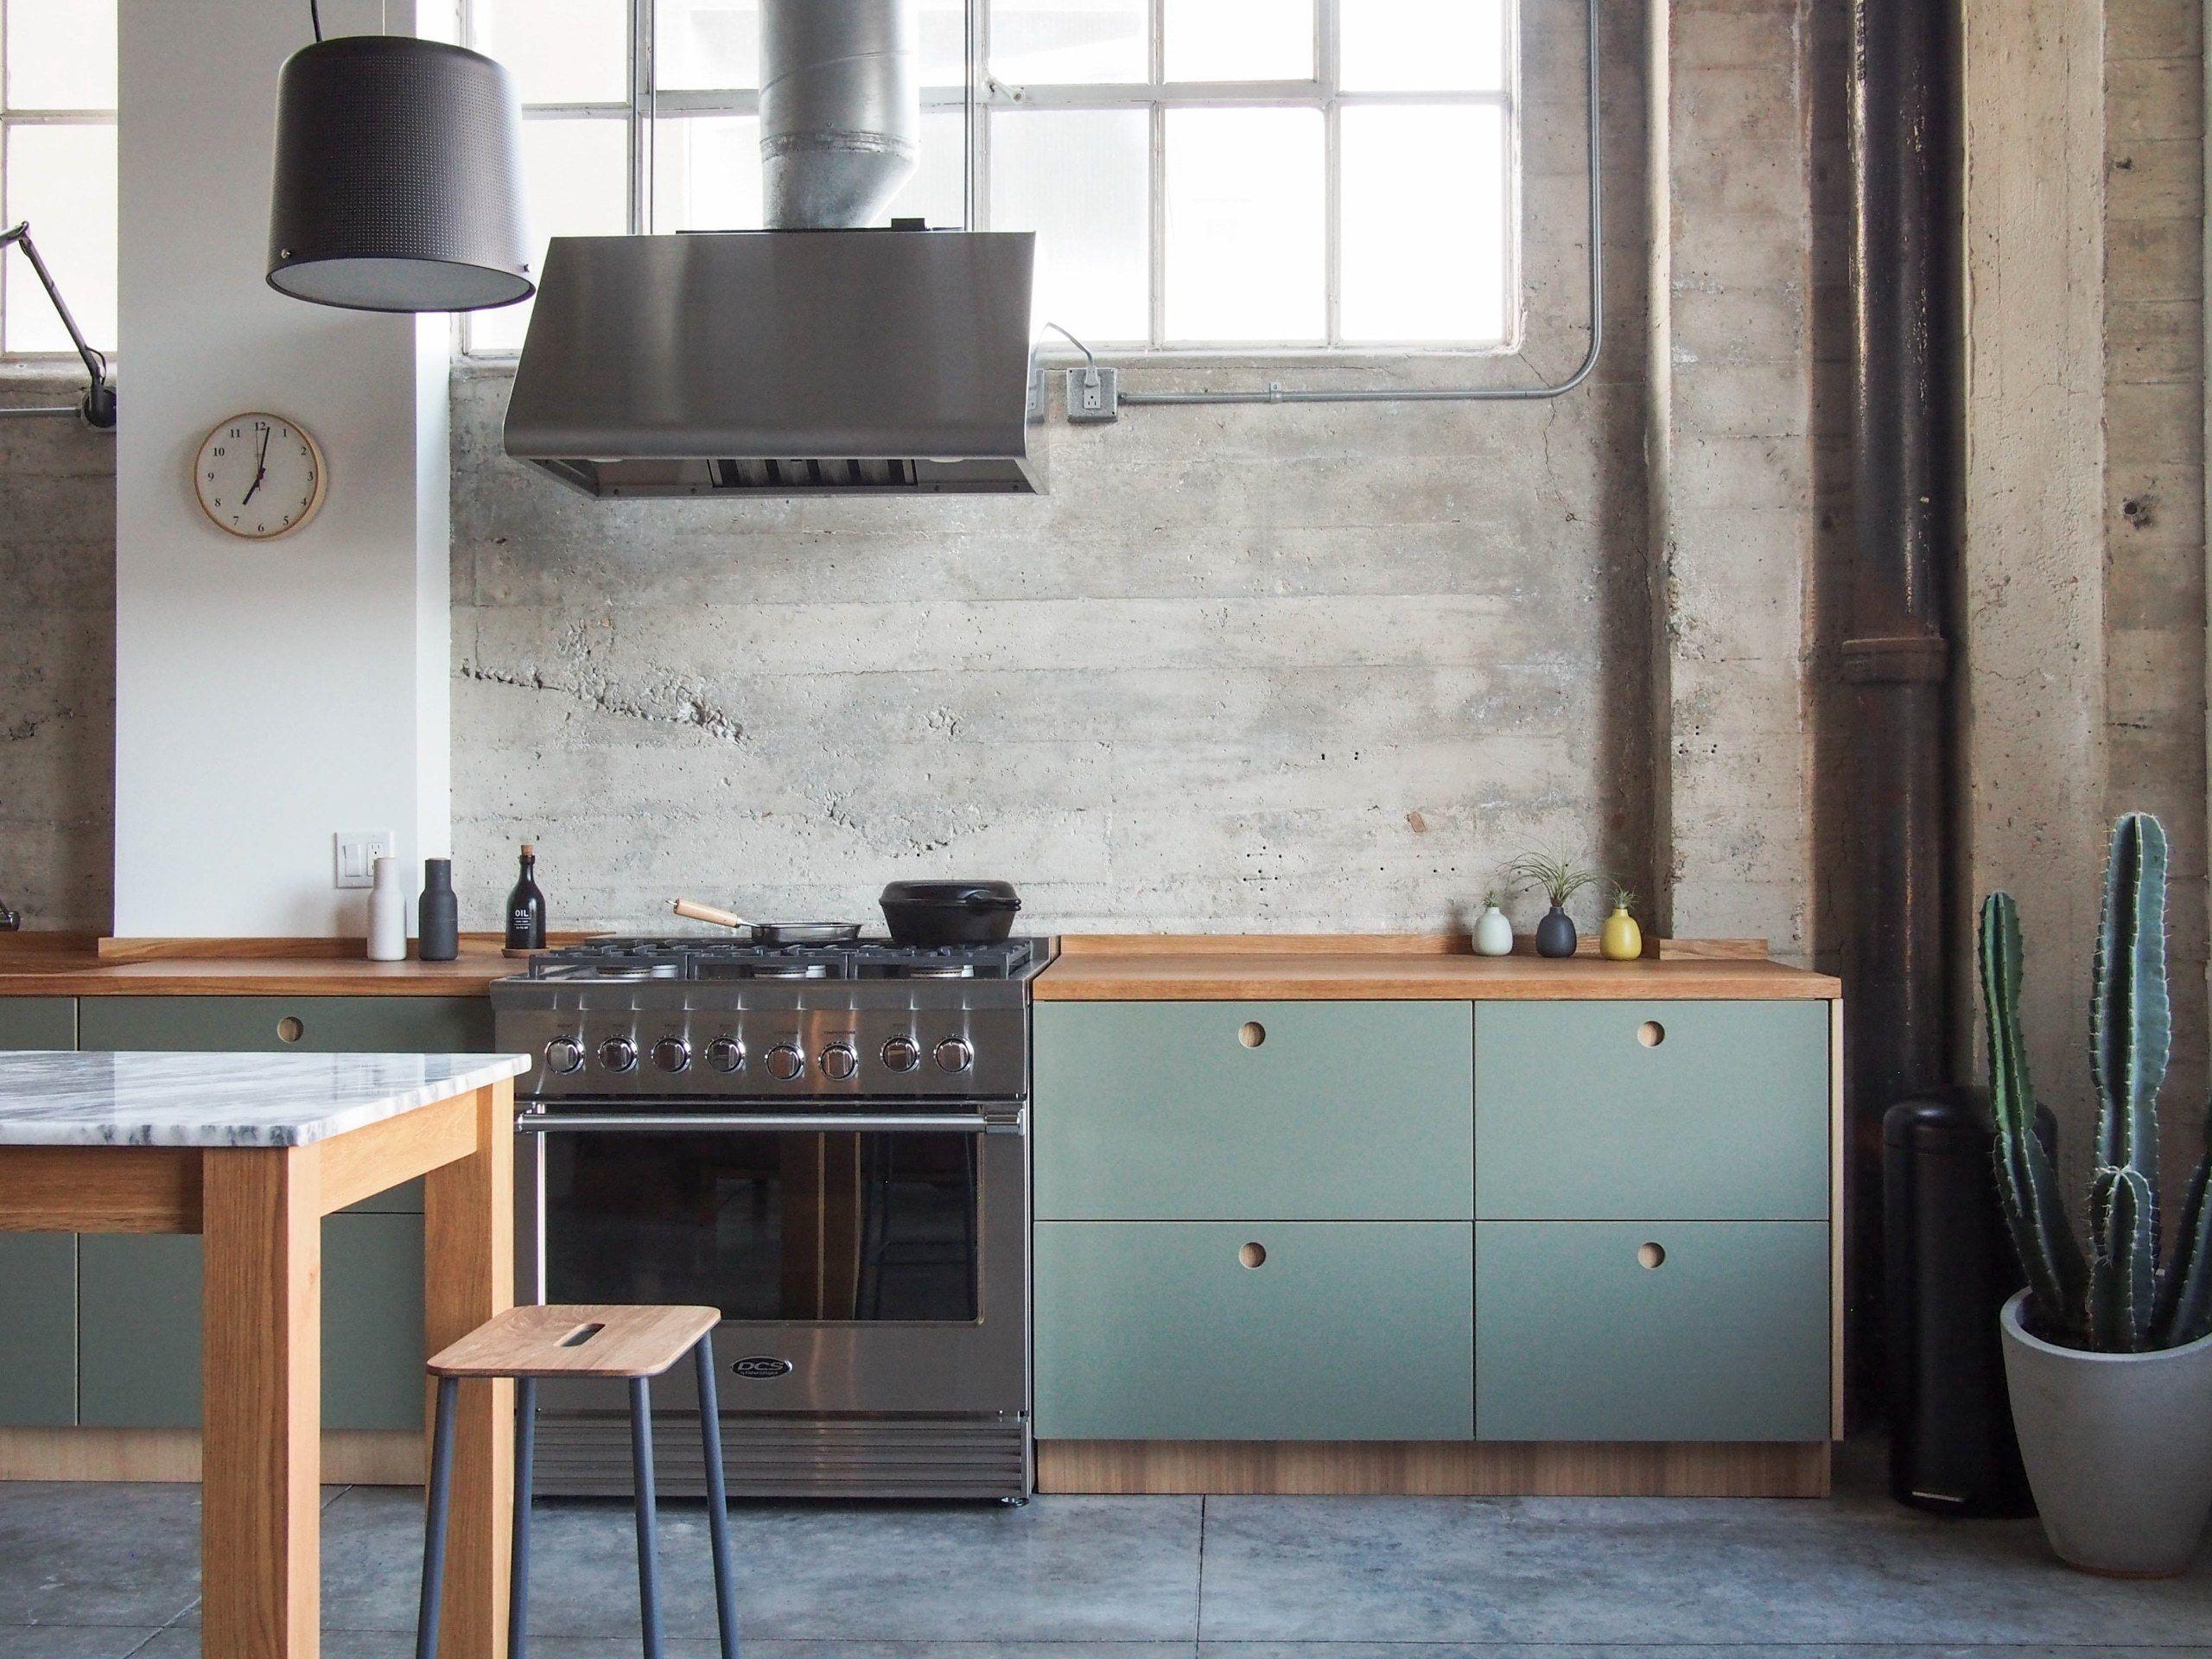 Photo 5 Of 9 In Modern Kitchen Upgrade Ideas From A Danish Design Modern Kitchen Upgrades Kitchen Design Trends Kitchen Upgrades